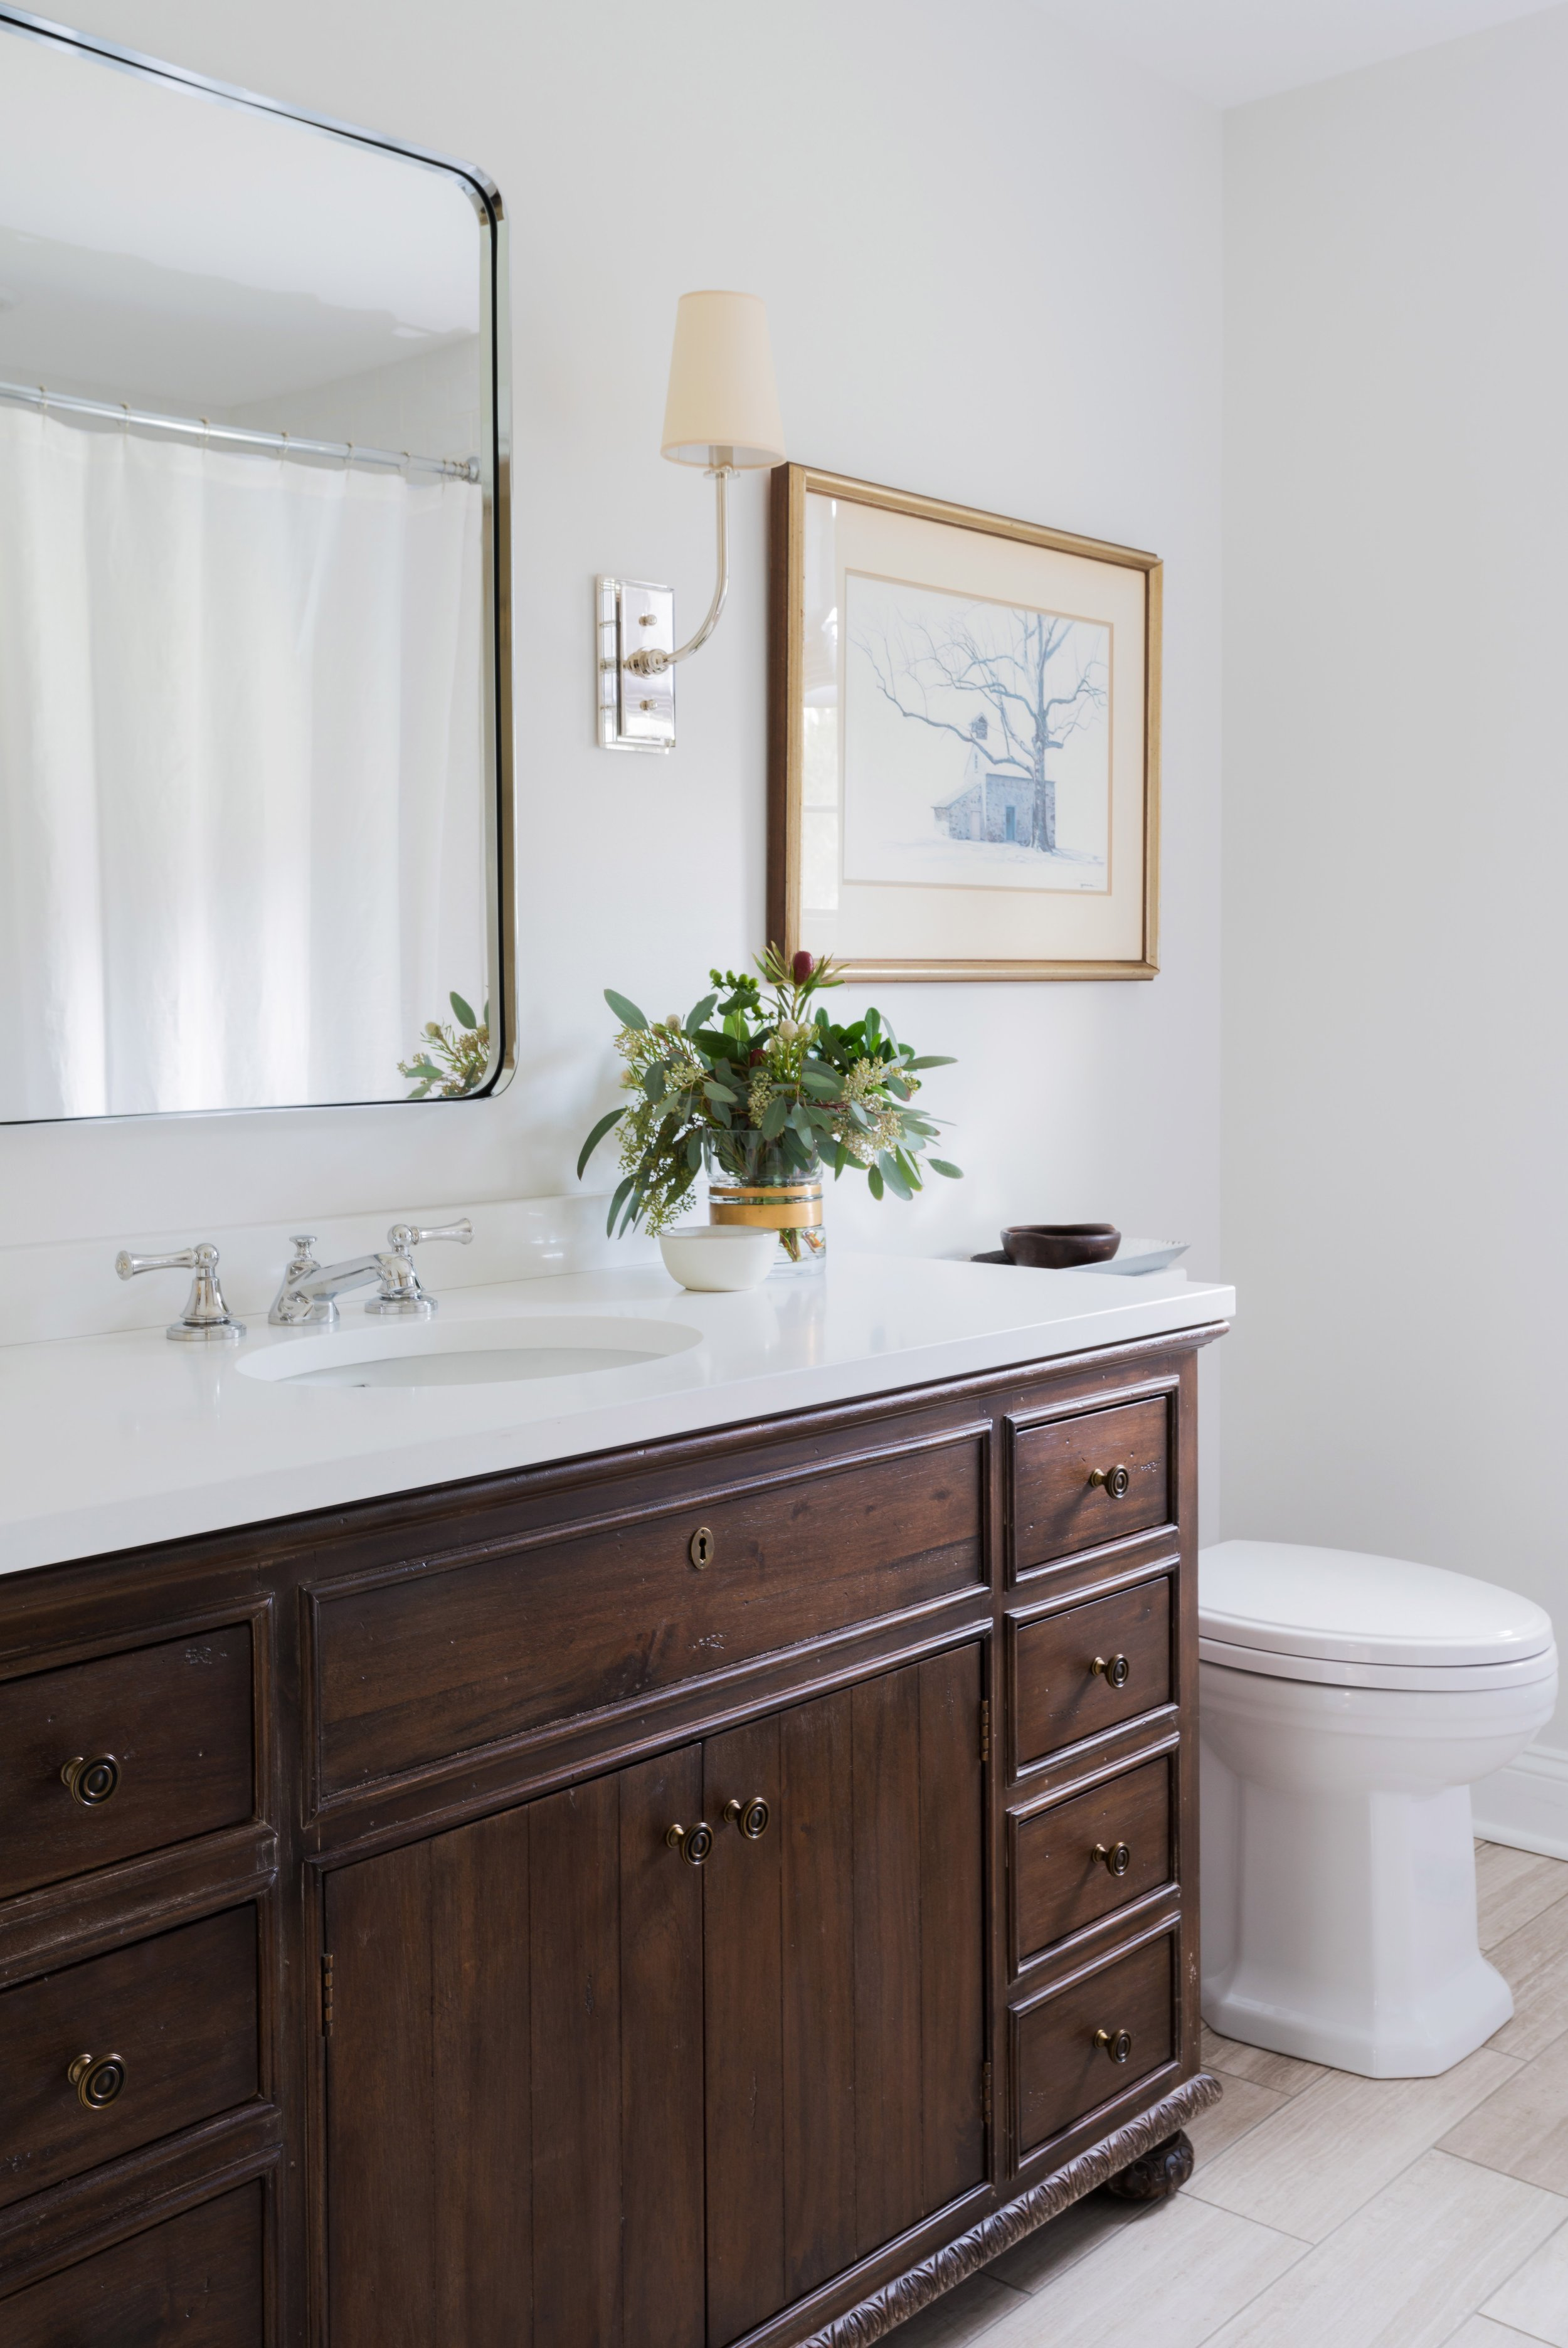 HeatherCourt-Bathroom-AntiqueVanity.JPG